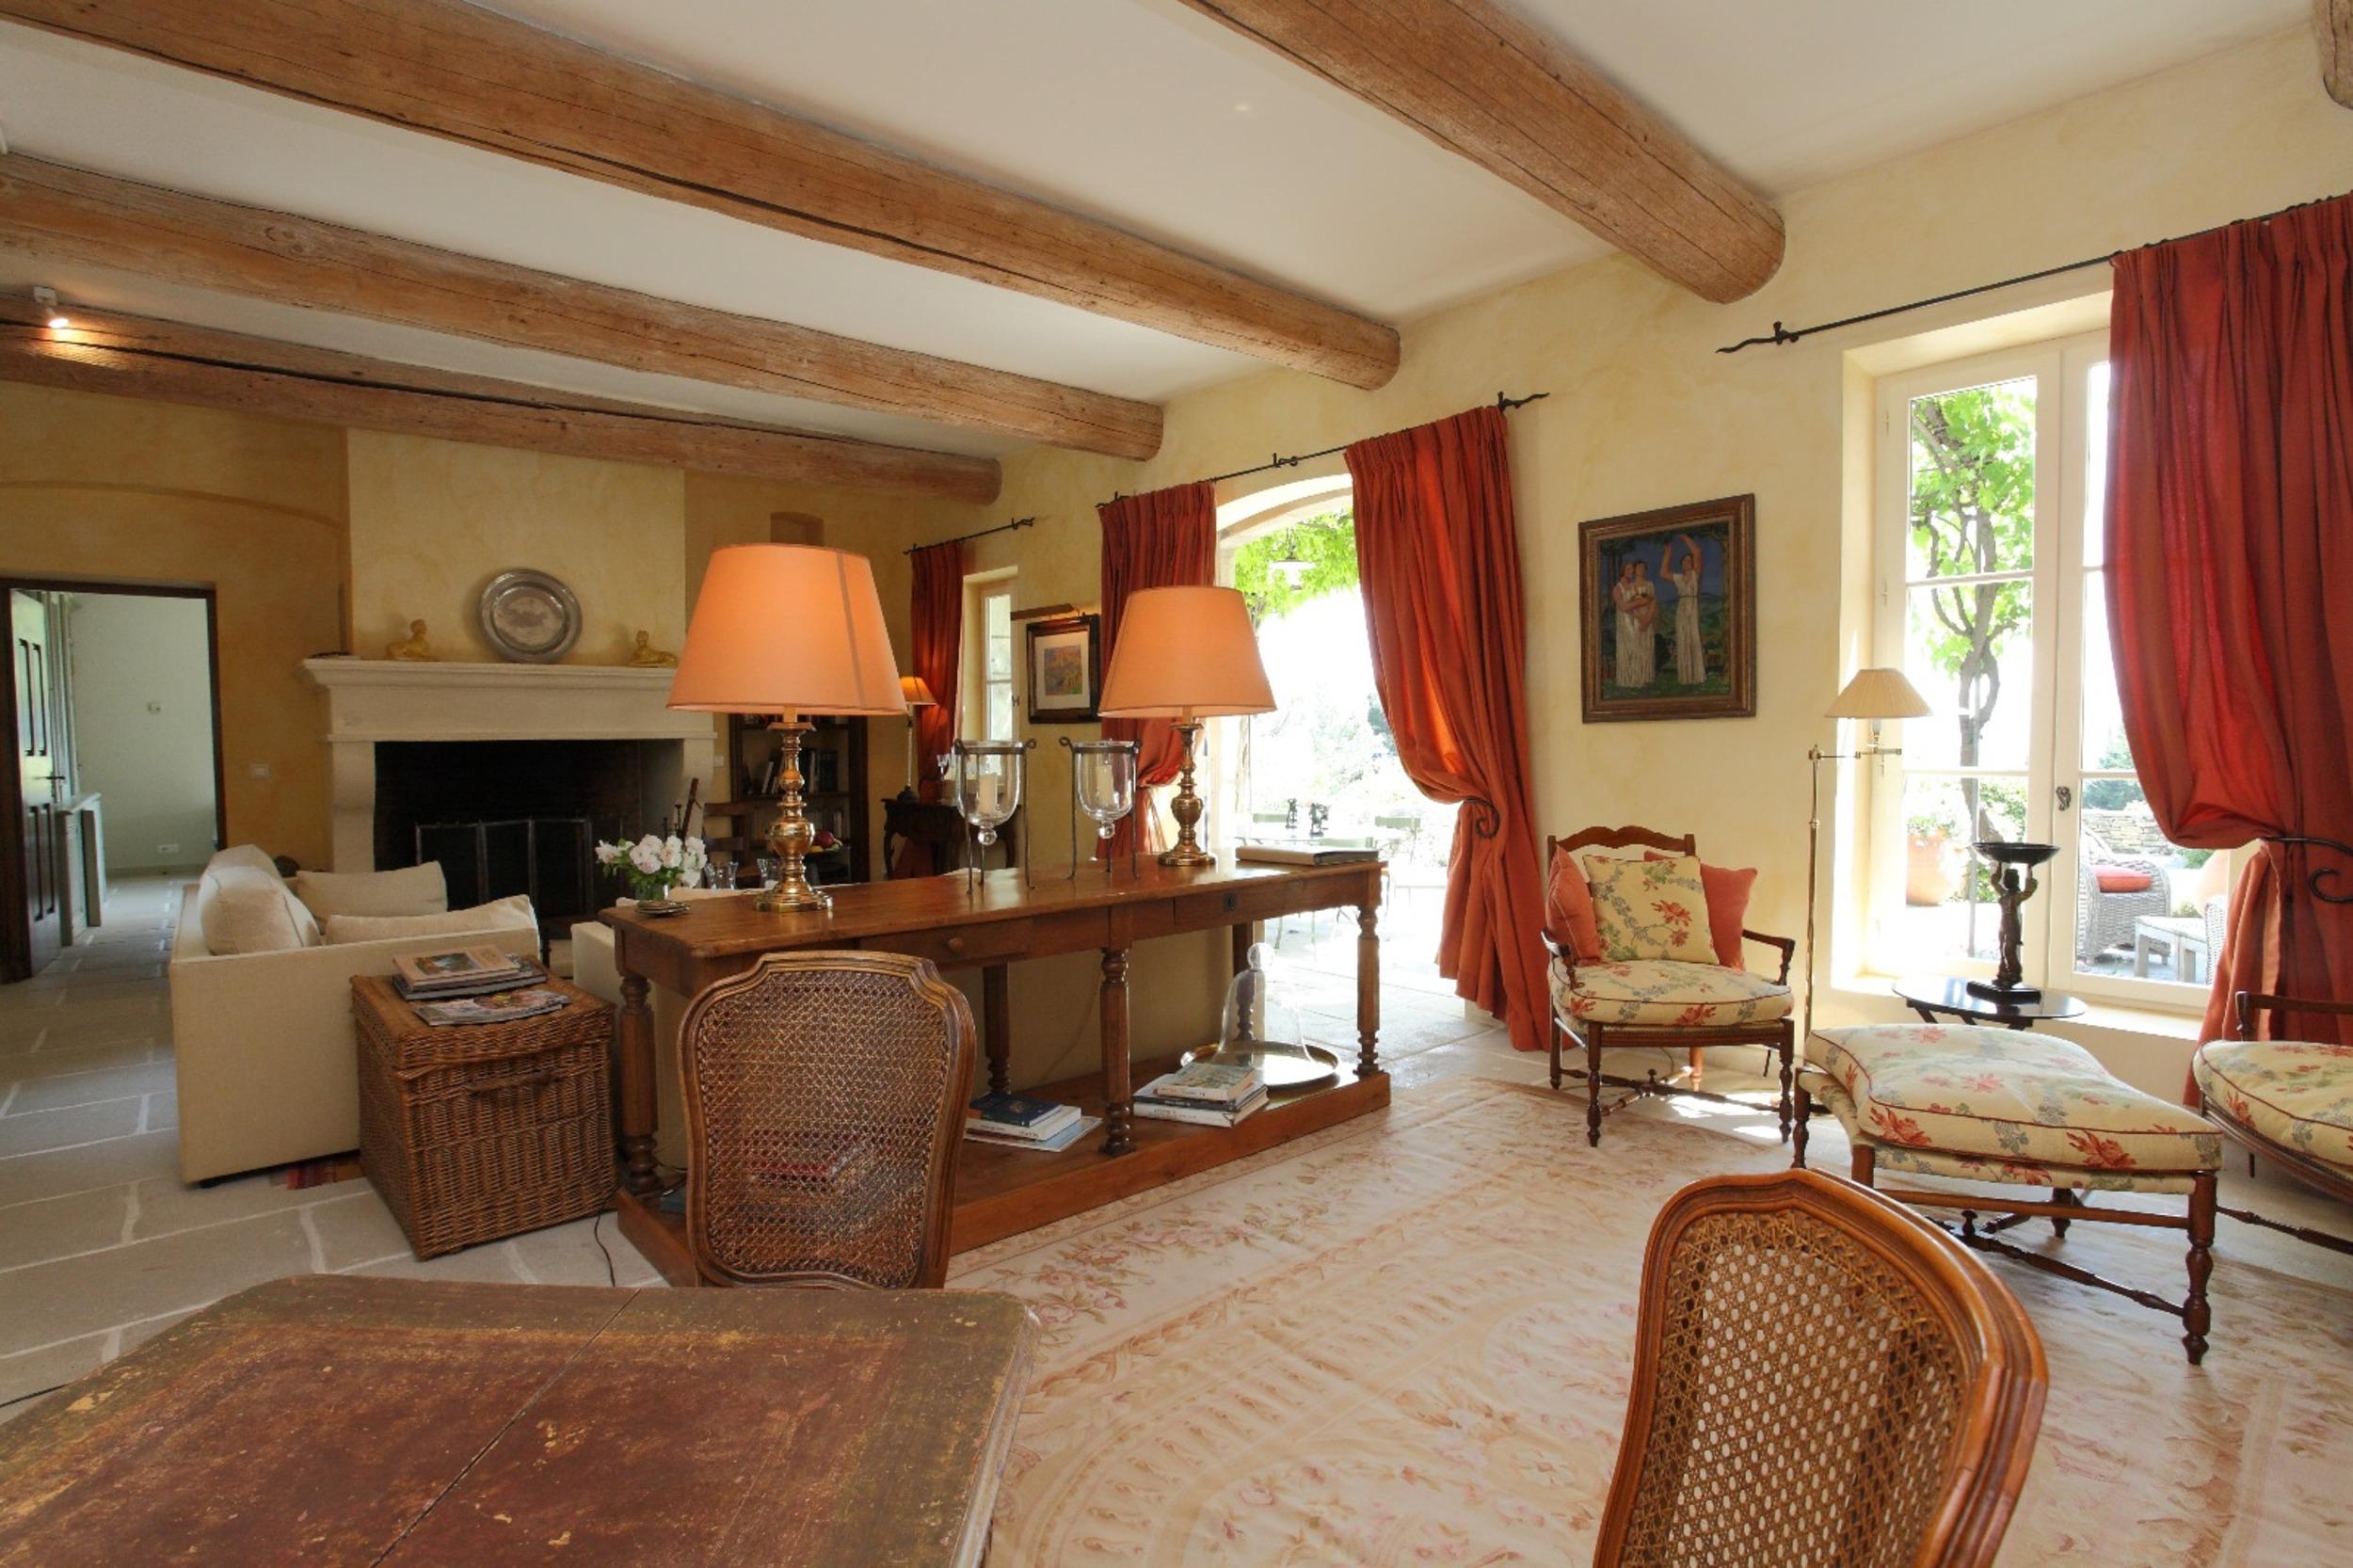 Holiday house Der Fall - Fabelhaftes Landhaus in Gordes (2520443), Gordes, Vaucluse, Provence - Alps - Côte d'Azur, France, picture 5